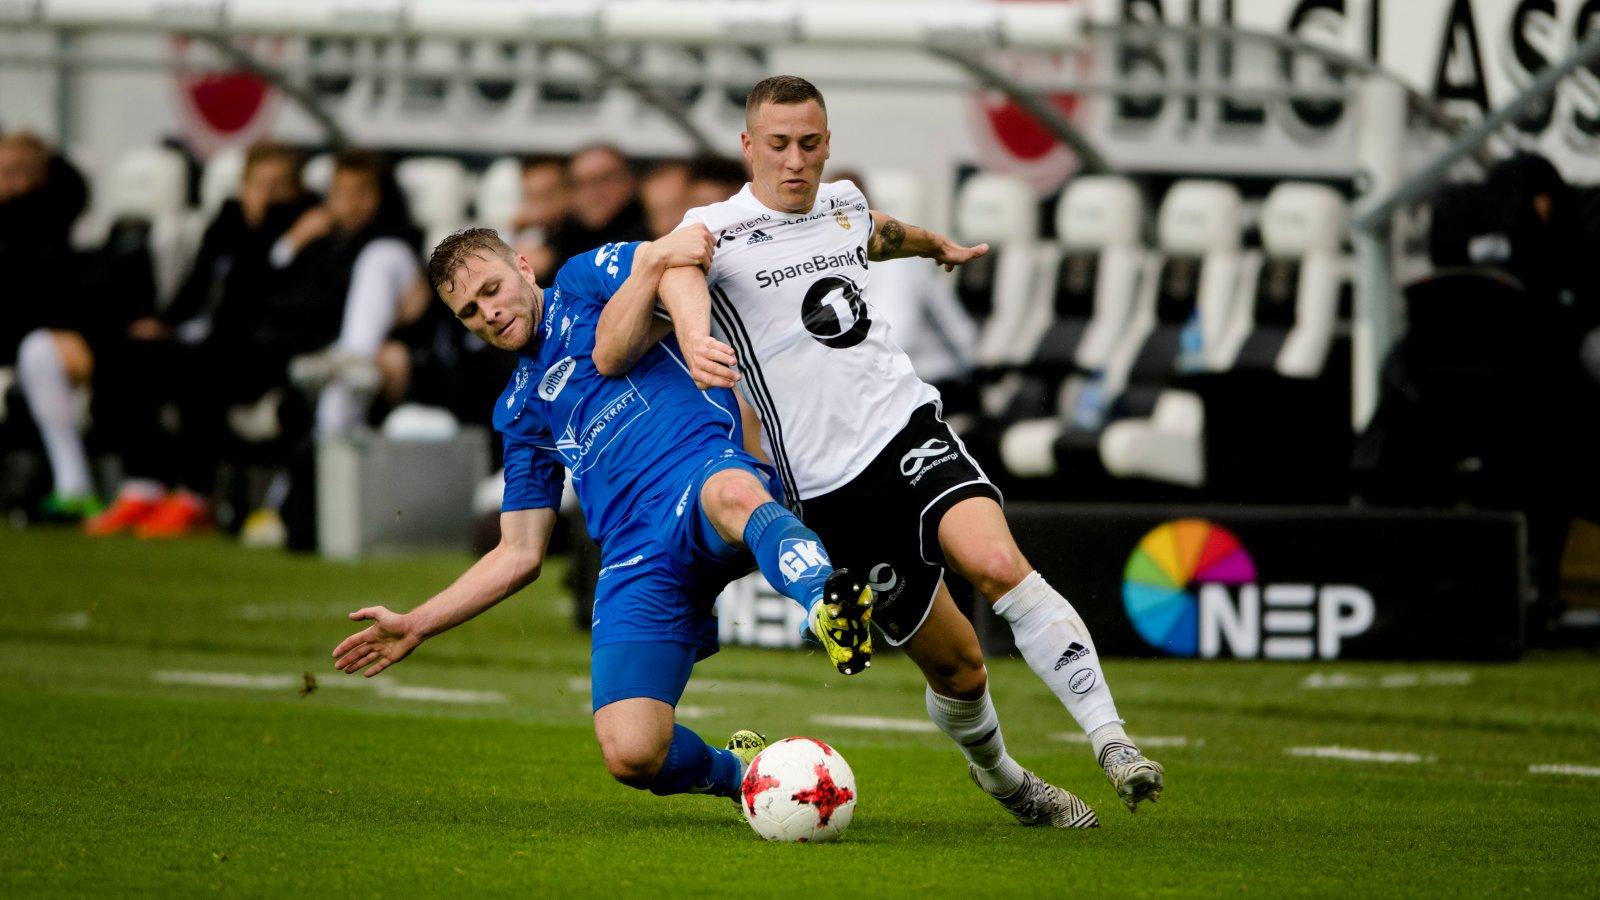 Rosenborg-vs-Viking-Noi-dai-mach-tran-bat-bai-20h30-ngay-13-7-giai-vo-dich-quoc-gia-Na-Uy-Eliteserien-2